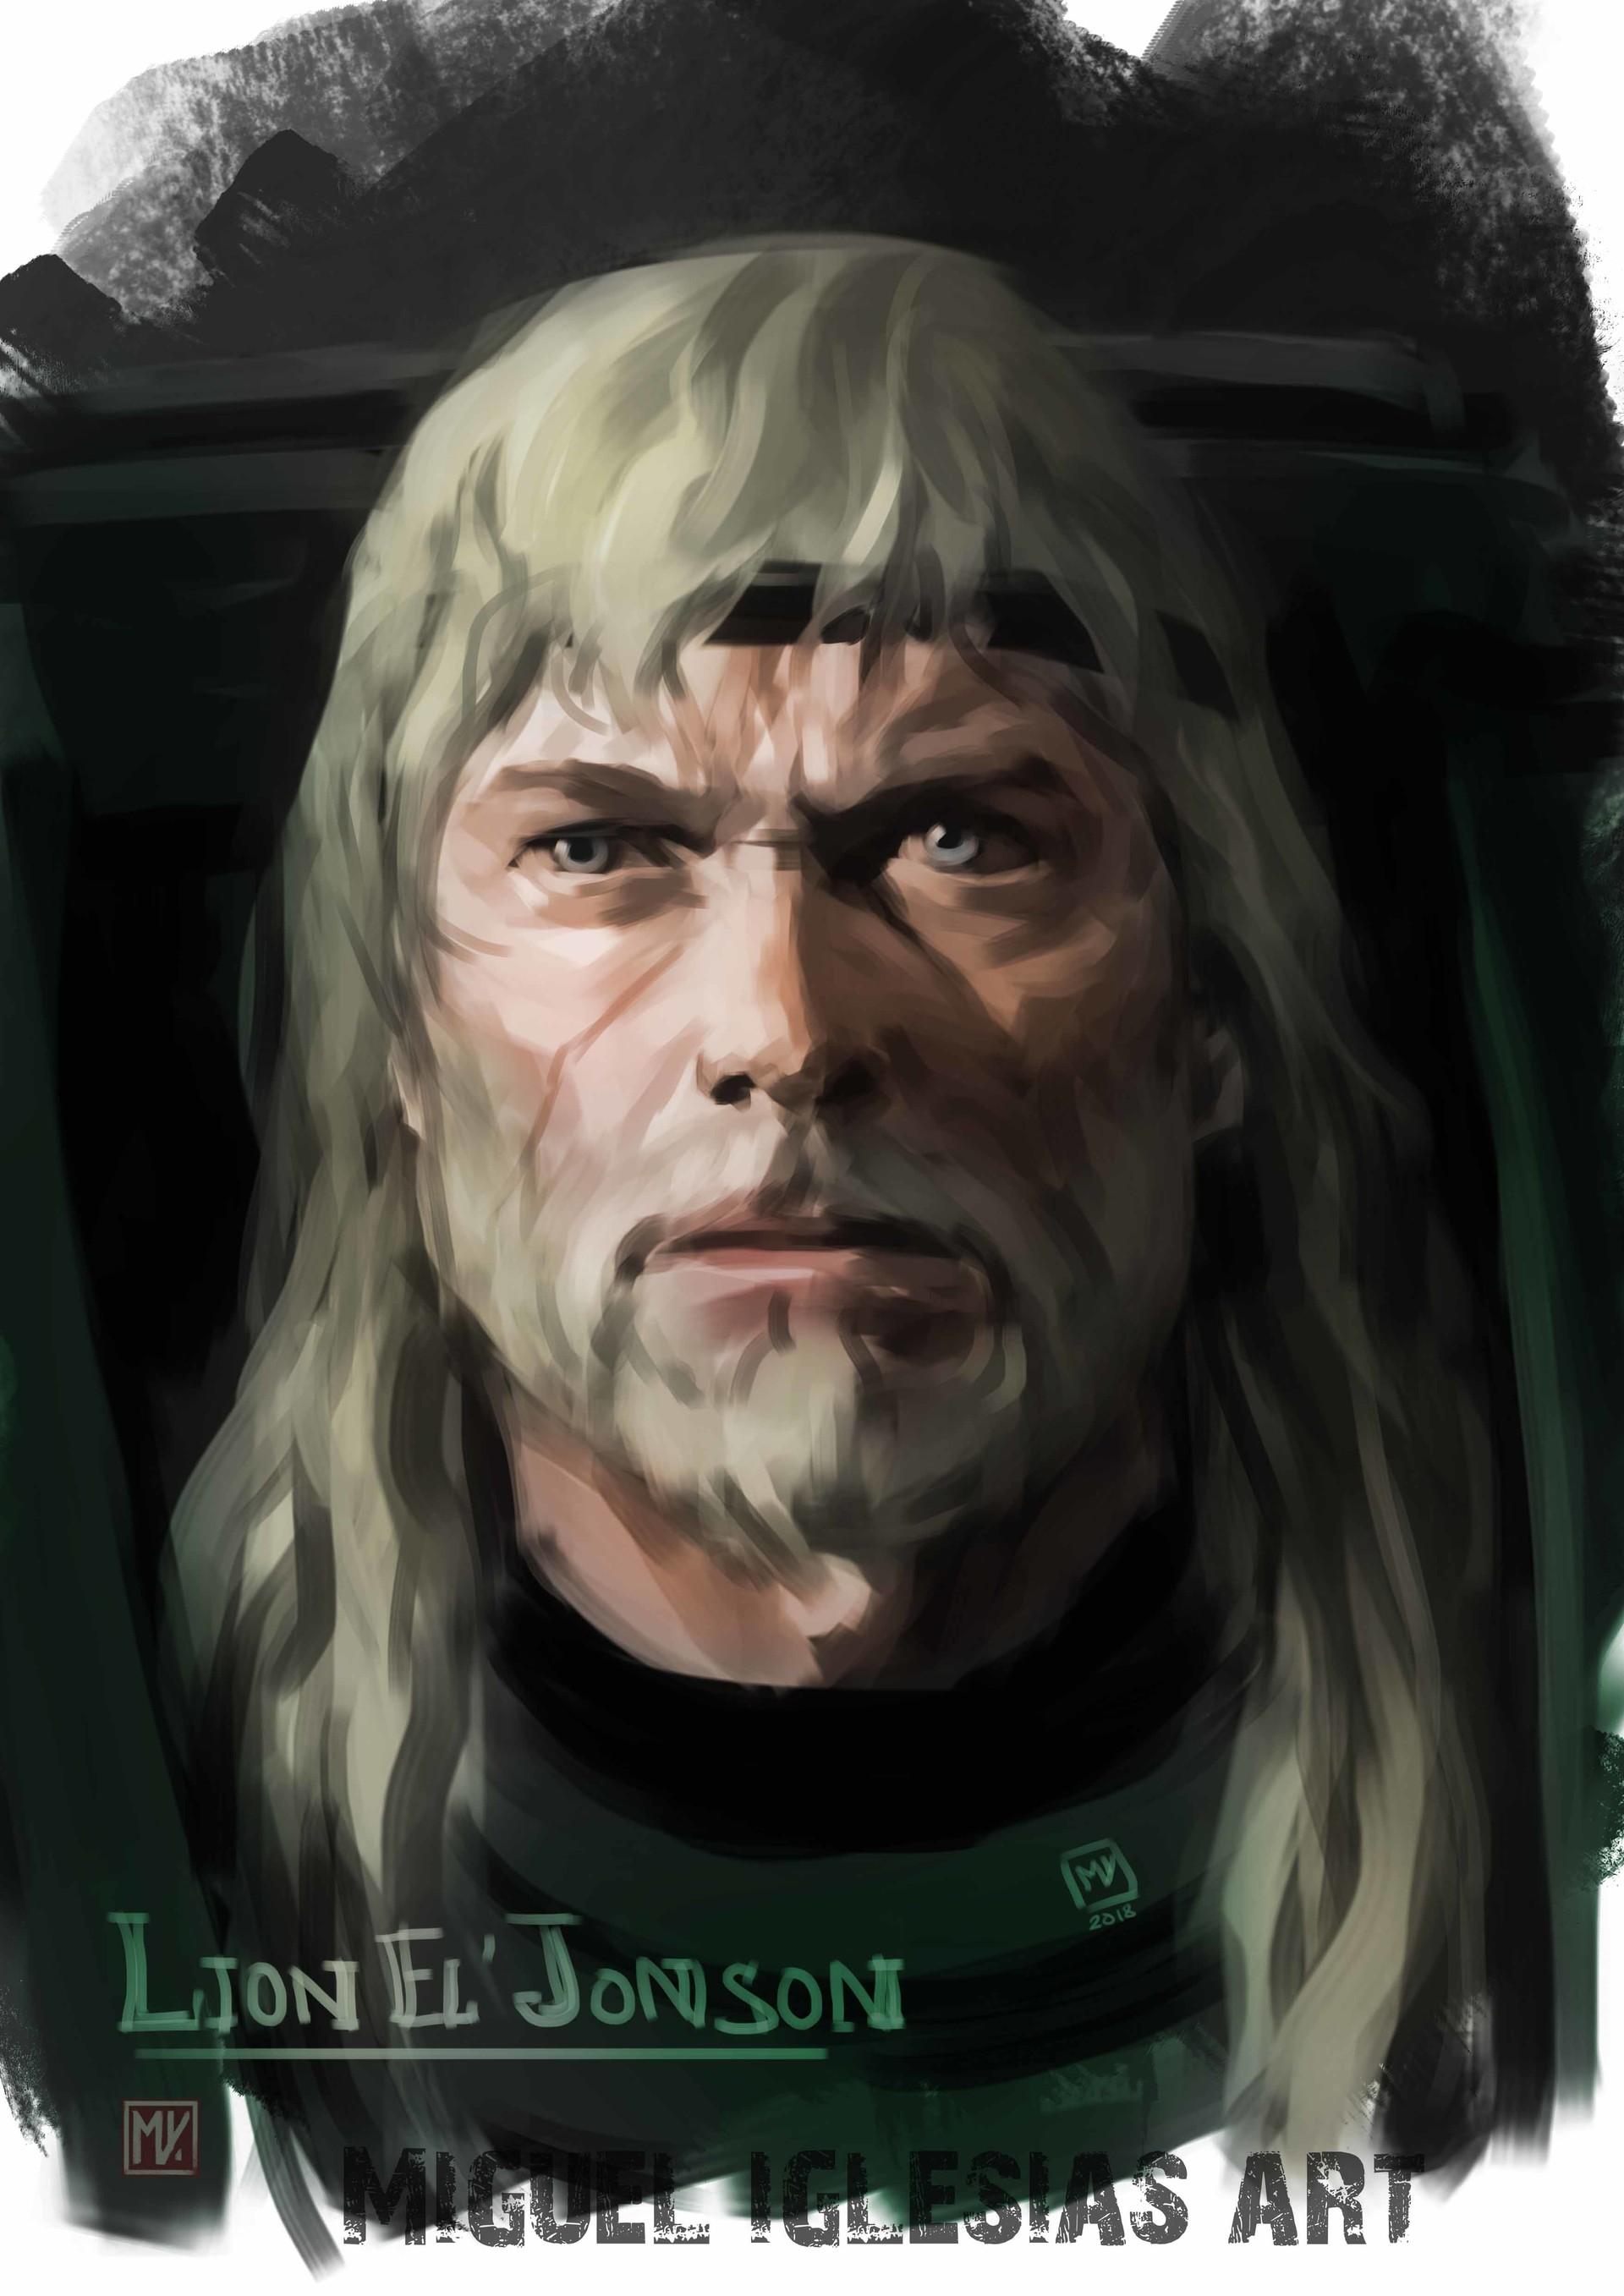 Miguel iglesias lioneljhonson withbear colored portrait x